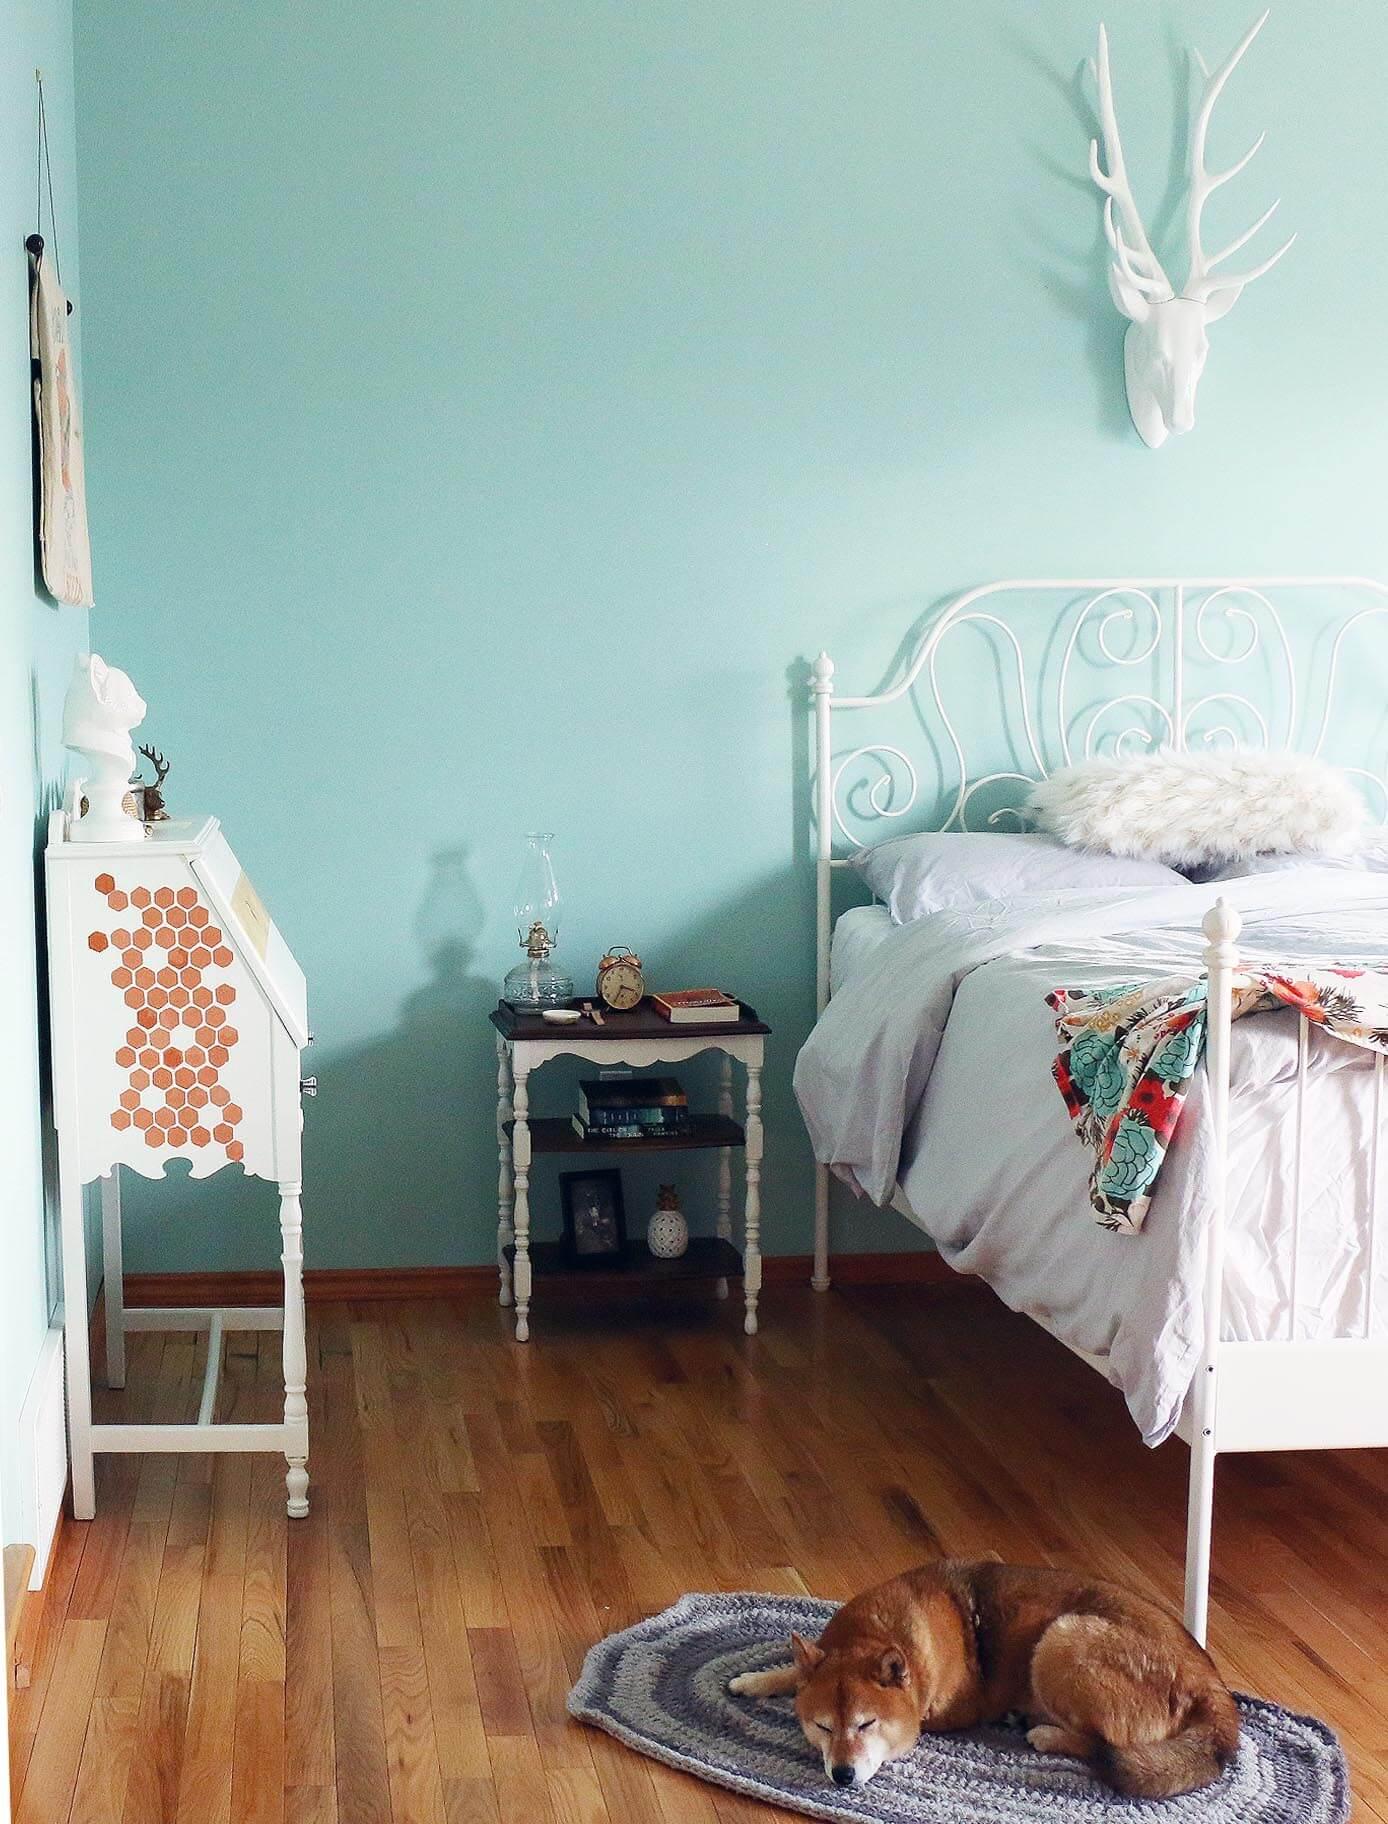 vintage-vibes-bedroom